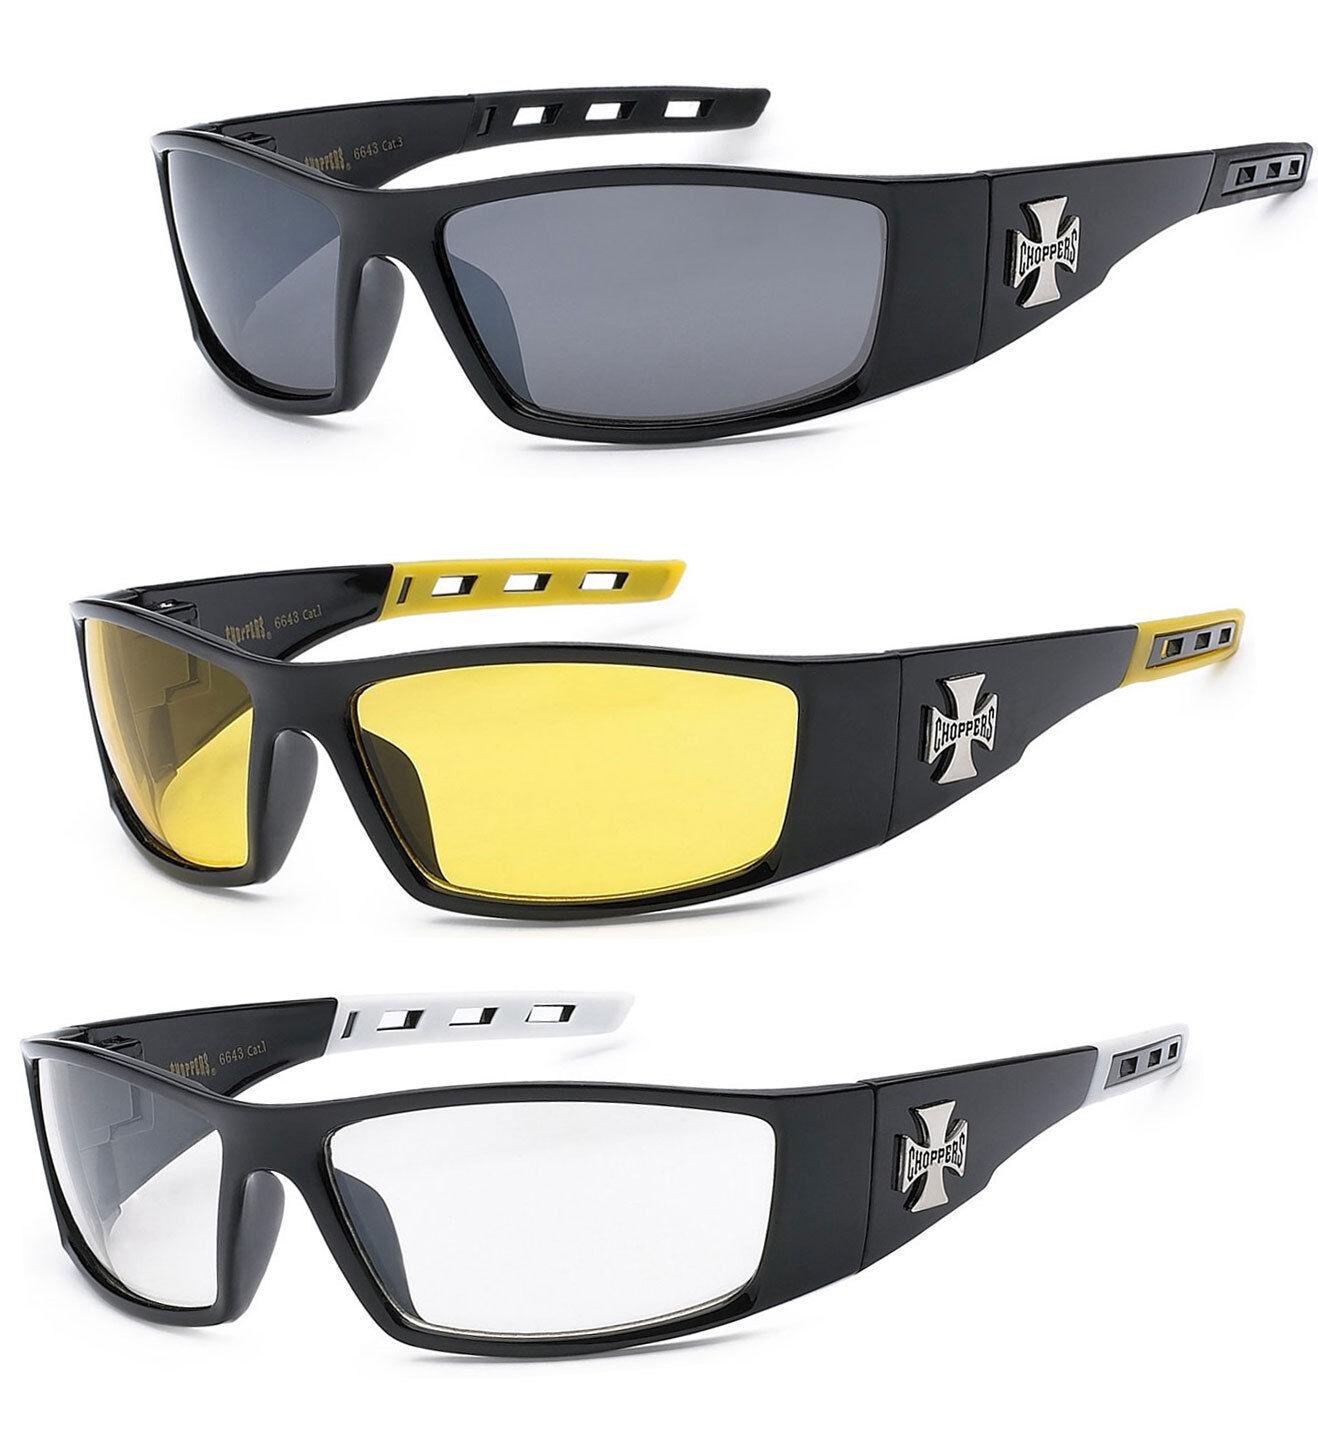 792ea78141608 3 PAIR COMBO Chopper Sunglasses Motorcycle Glasses Smoke Yellow ...